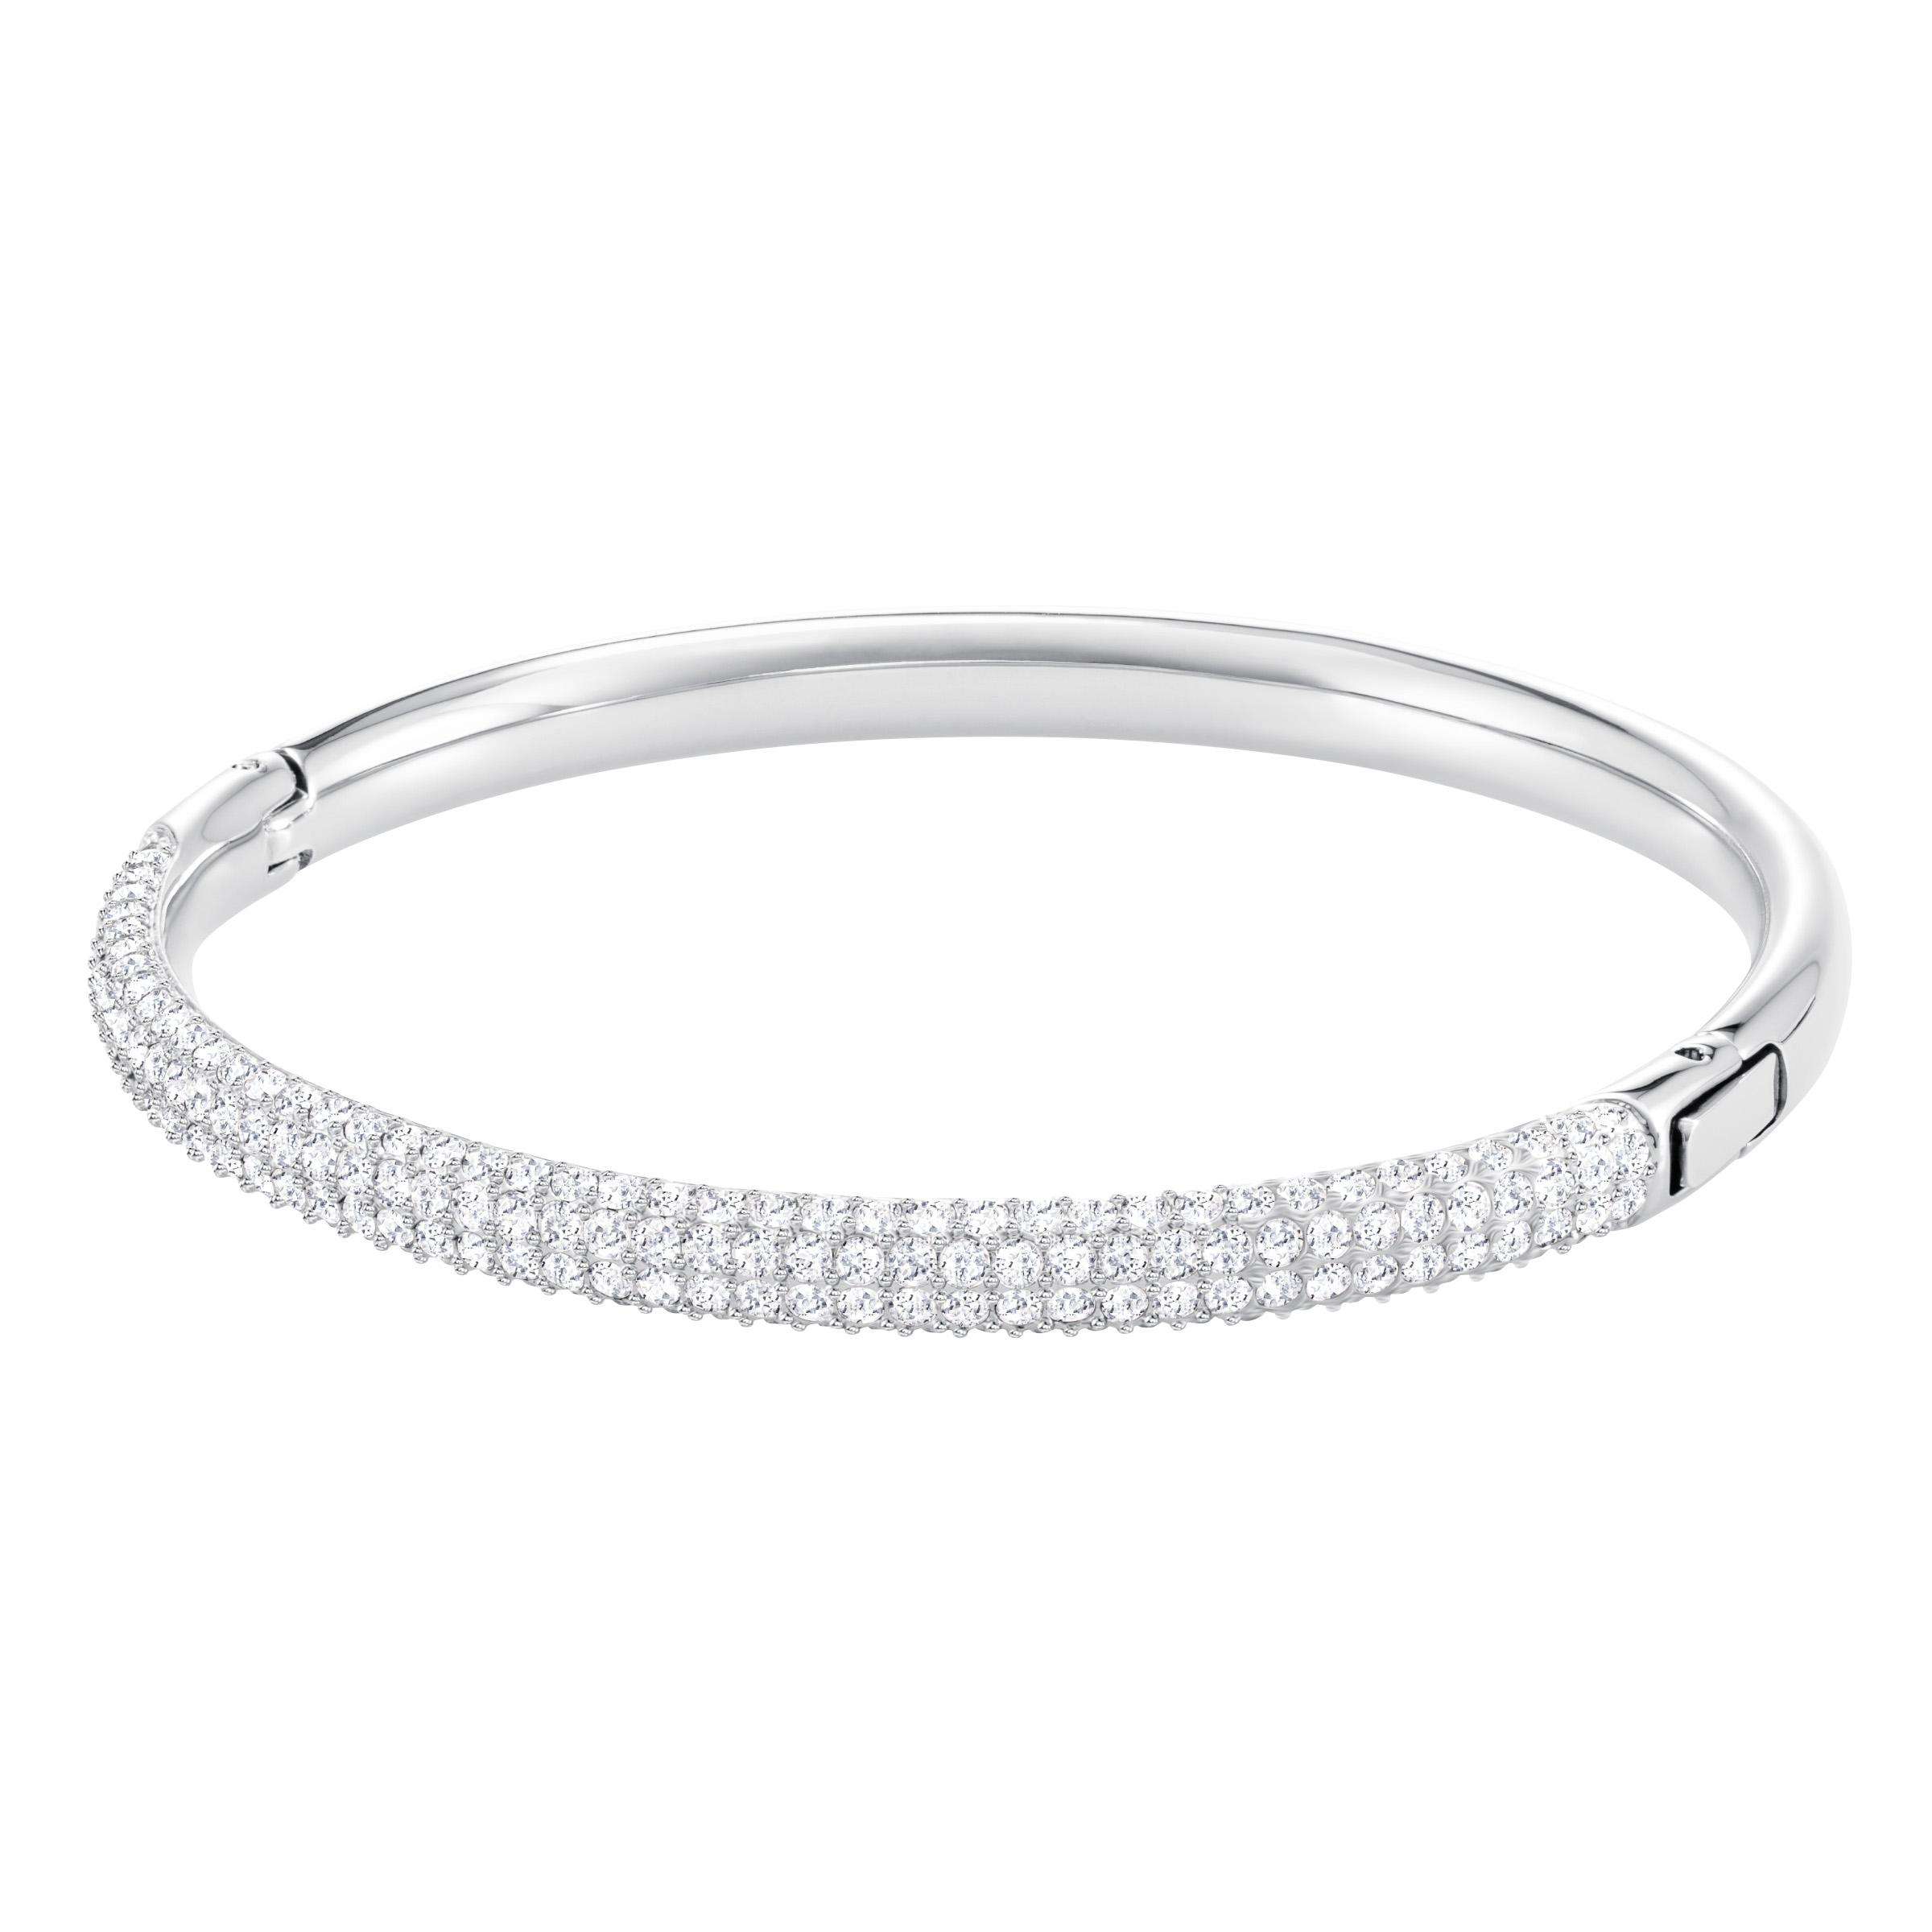 Bracelet-jonc Stone, blanc, métal rhodié, Swarovski